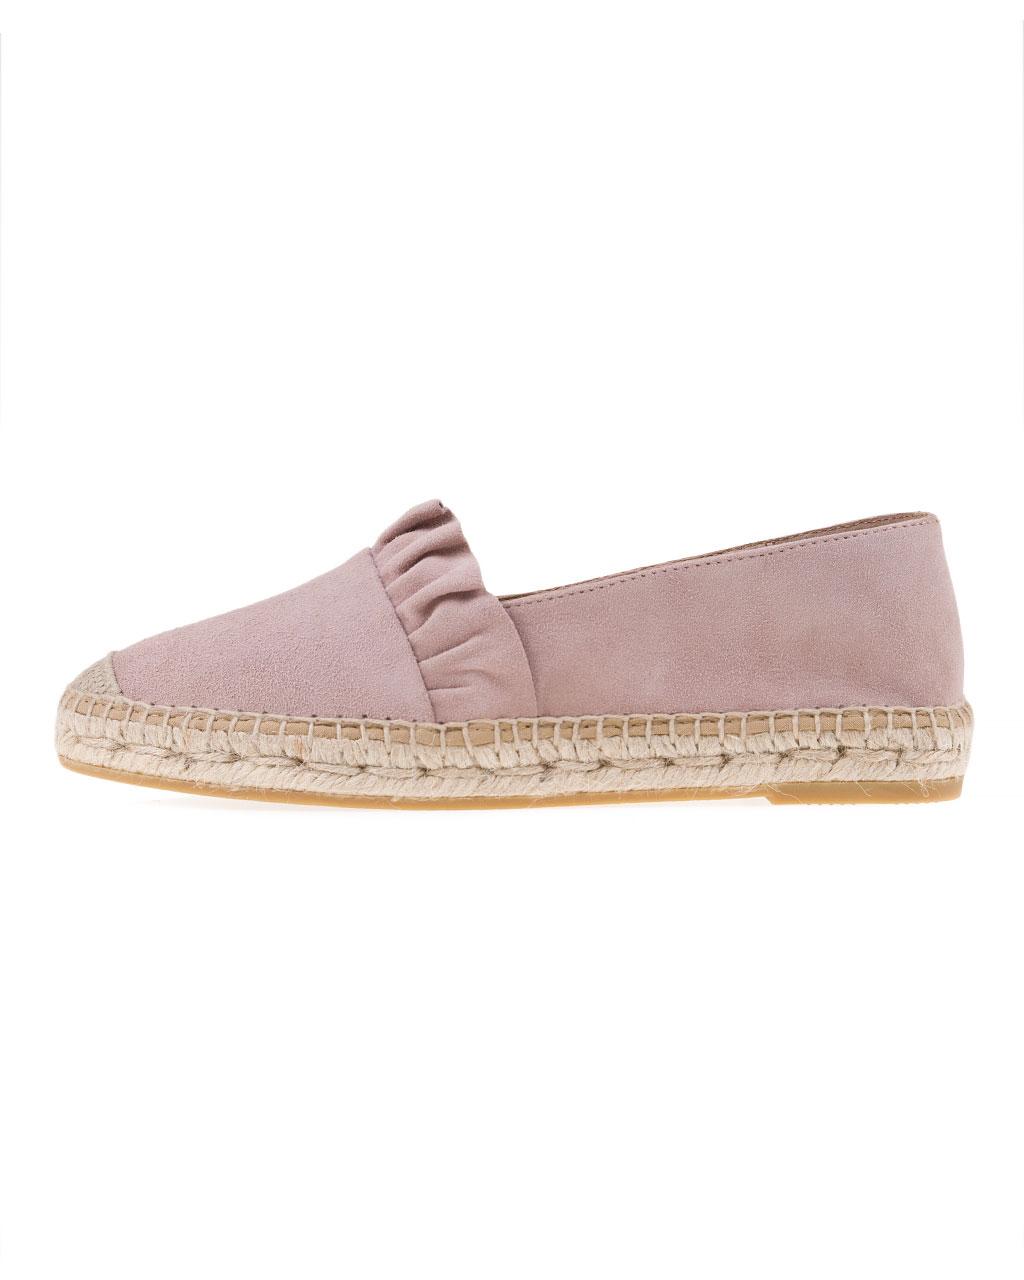 Women's shoes KANNA (original) KV8000/8-беж  — buy online